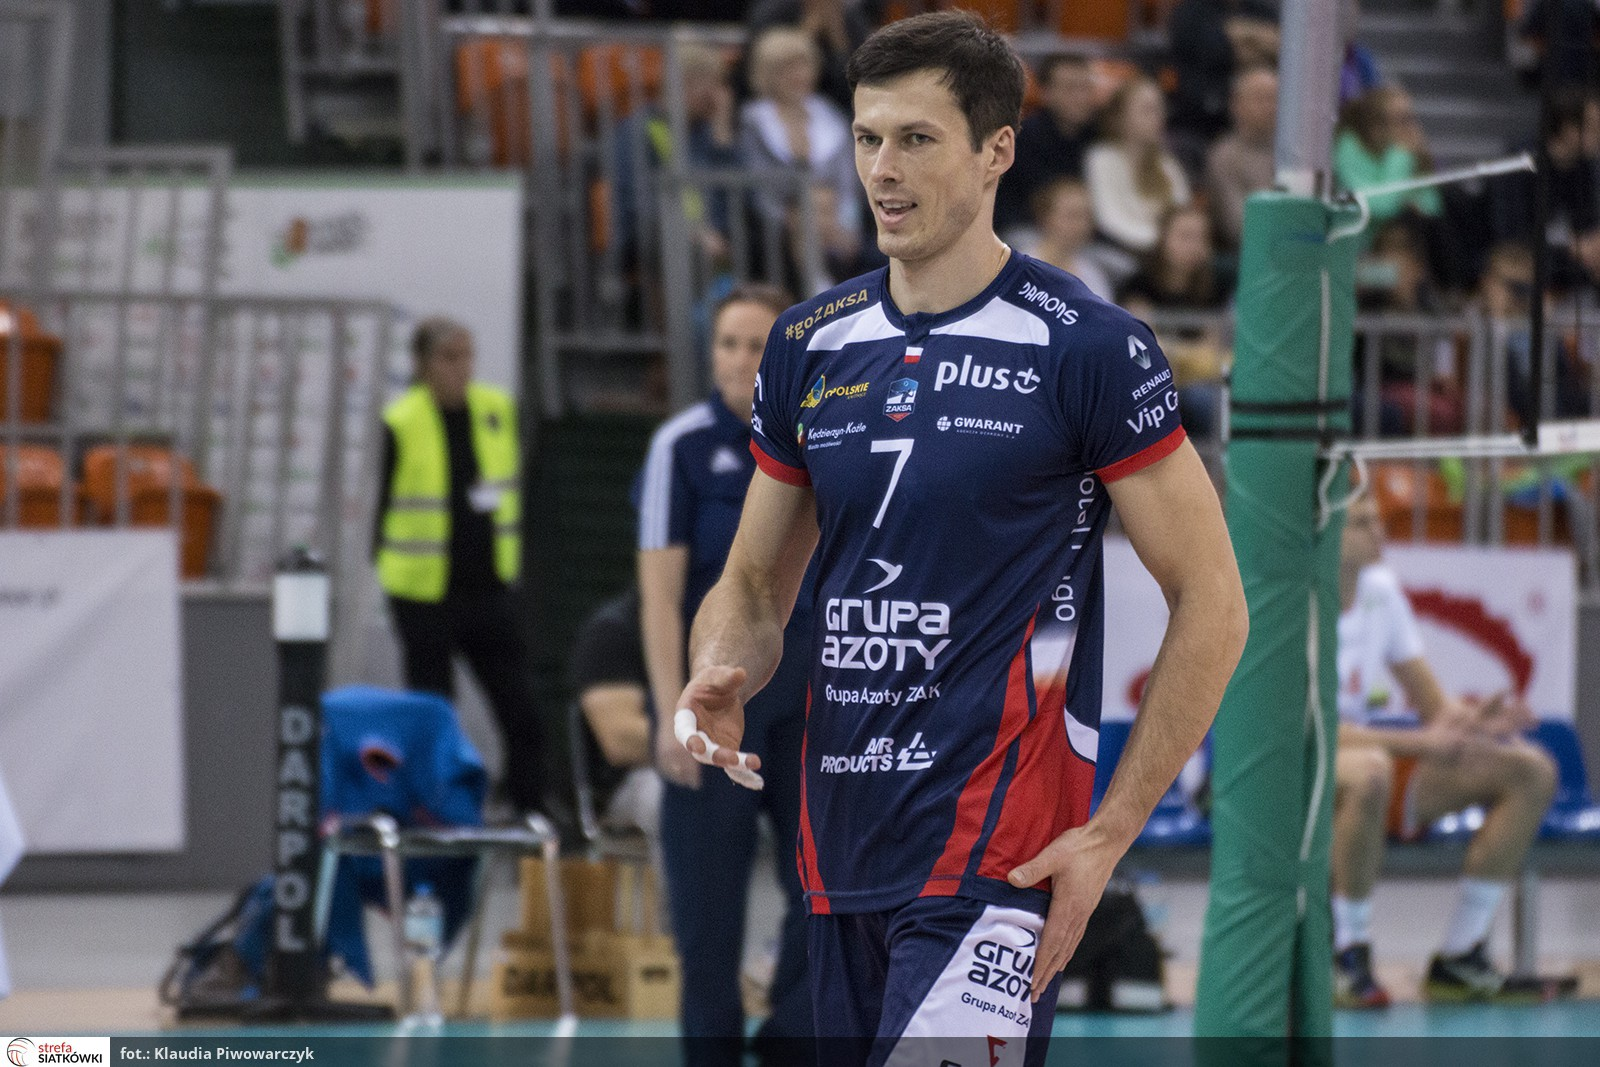 8 - Rafał Buszek